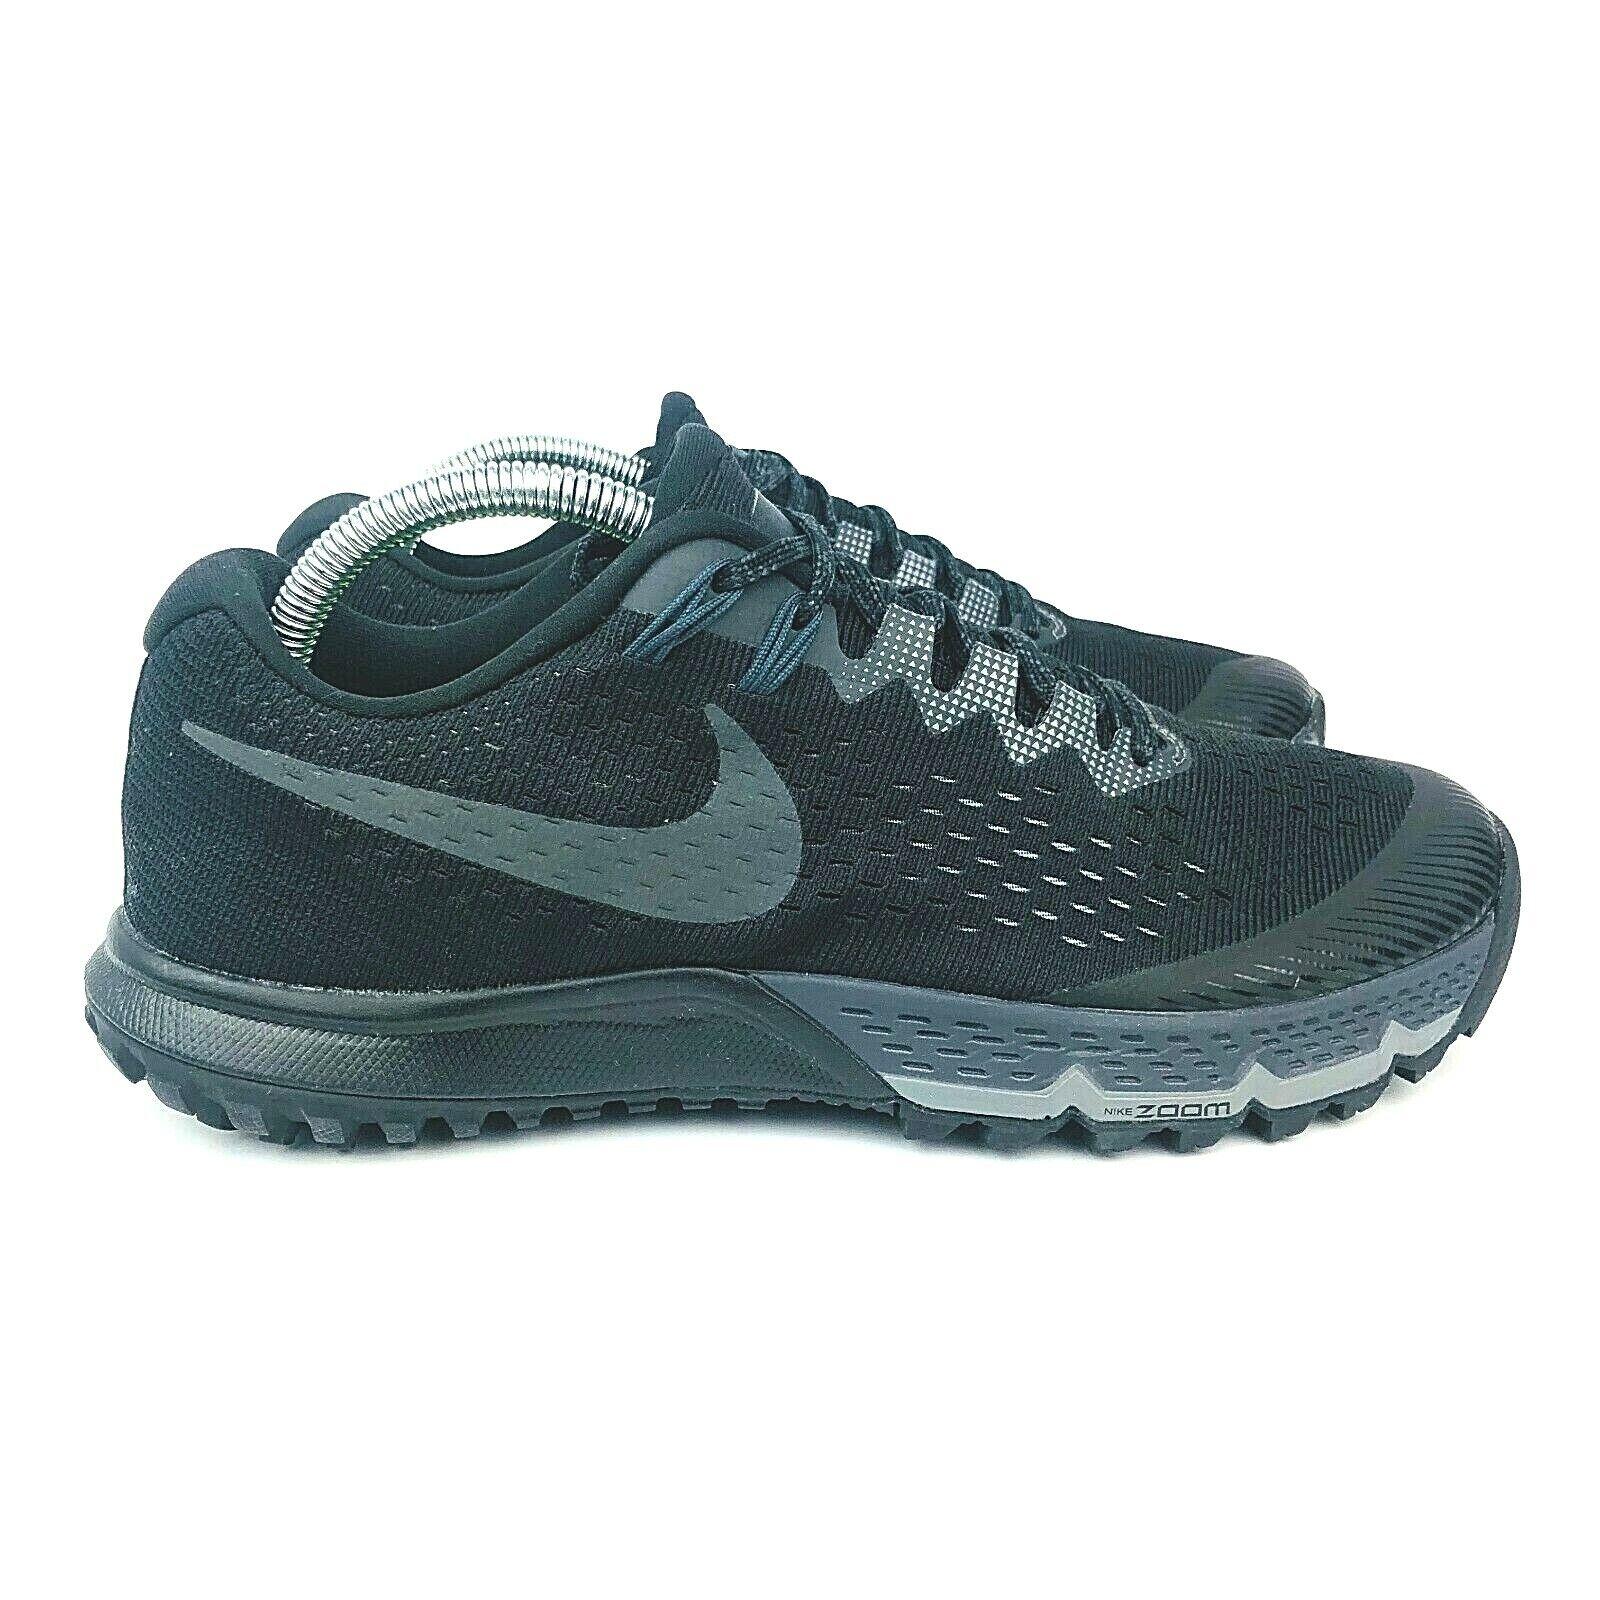 Nike Zoom Terra Kiger 4 Triple Air Negro 880563 010 senderismo zapatos talla 8